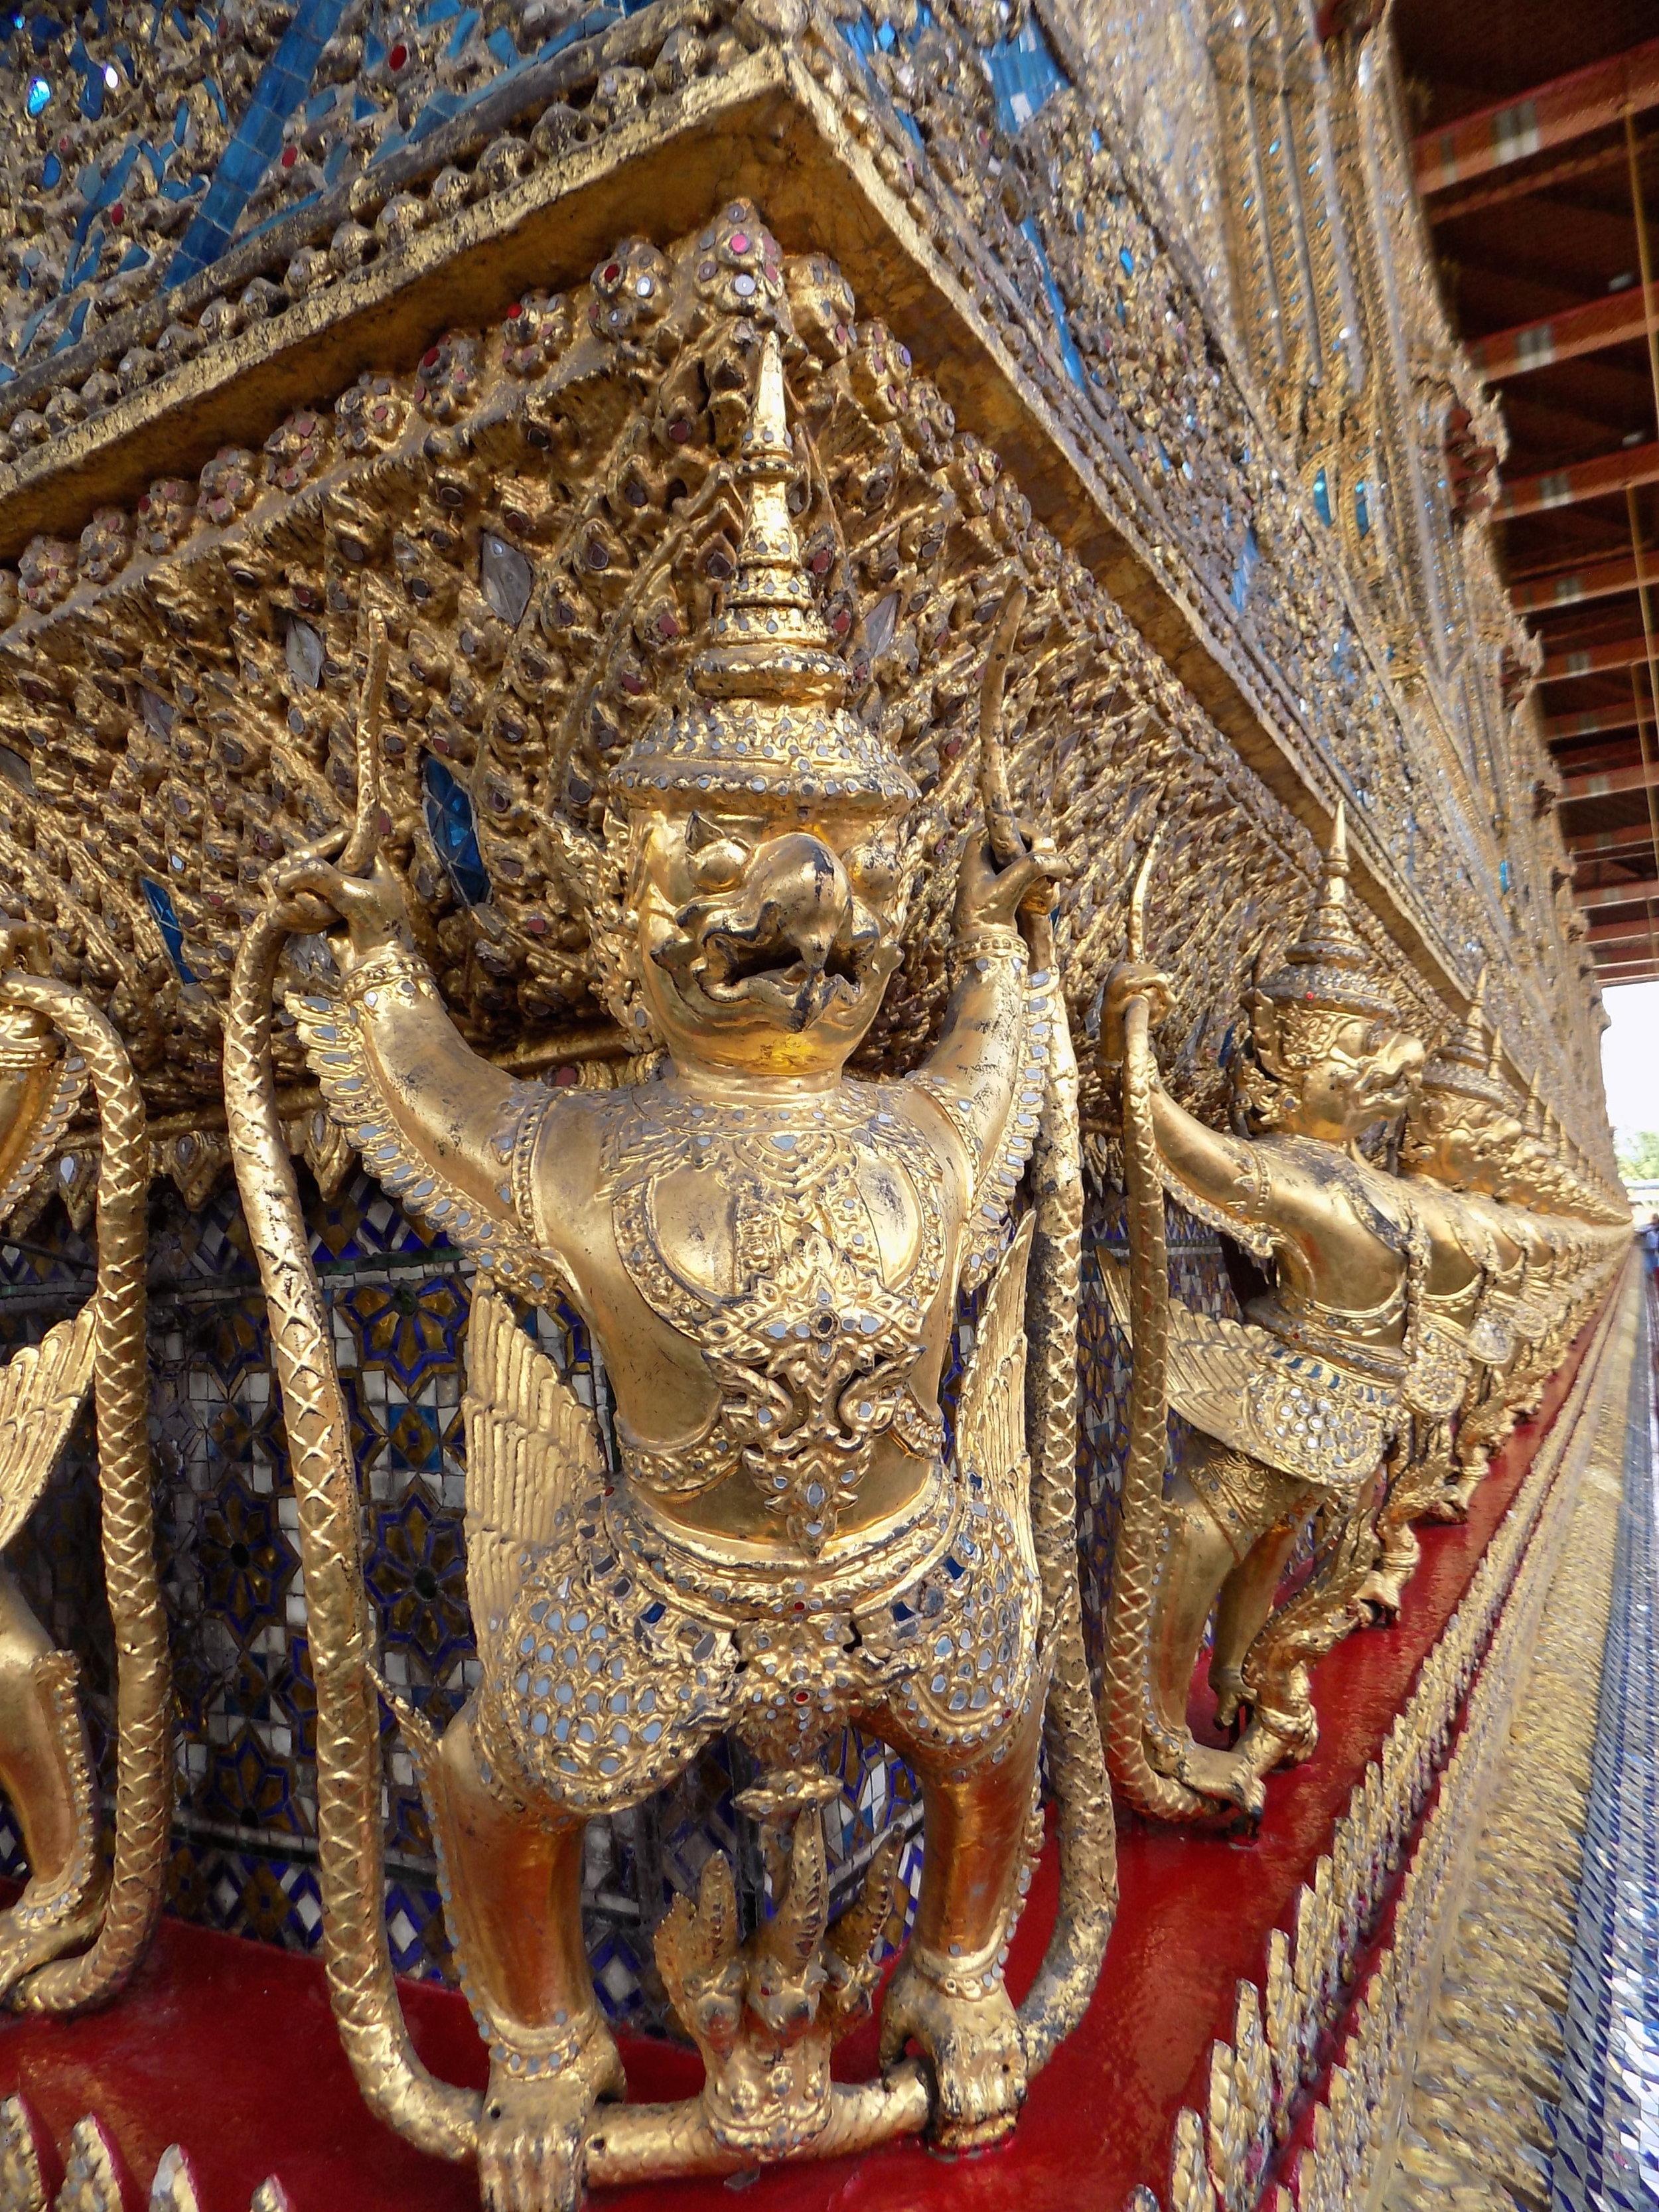 Bangkok's Grand Palace - outside The Emerald Buddah